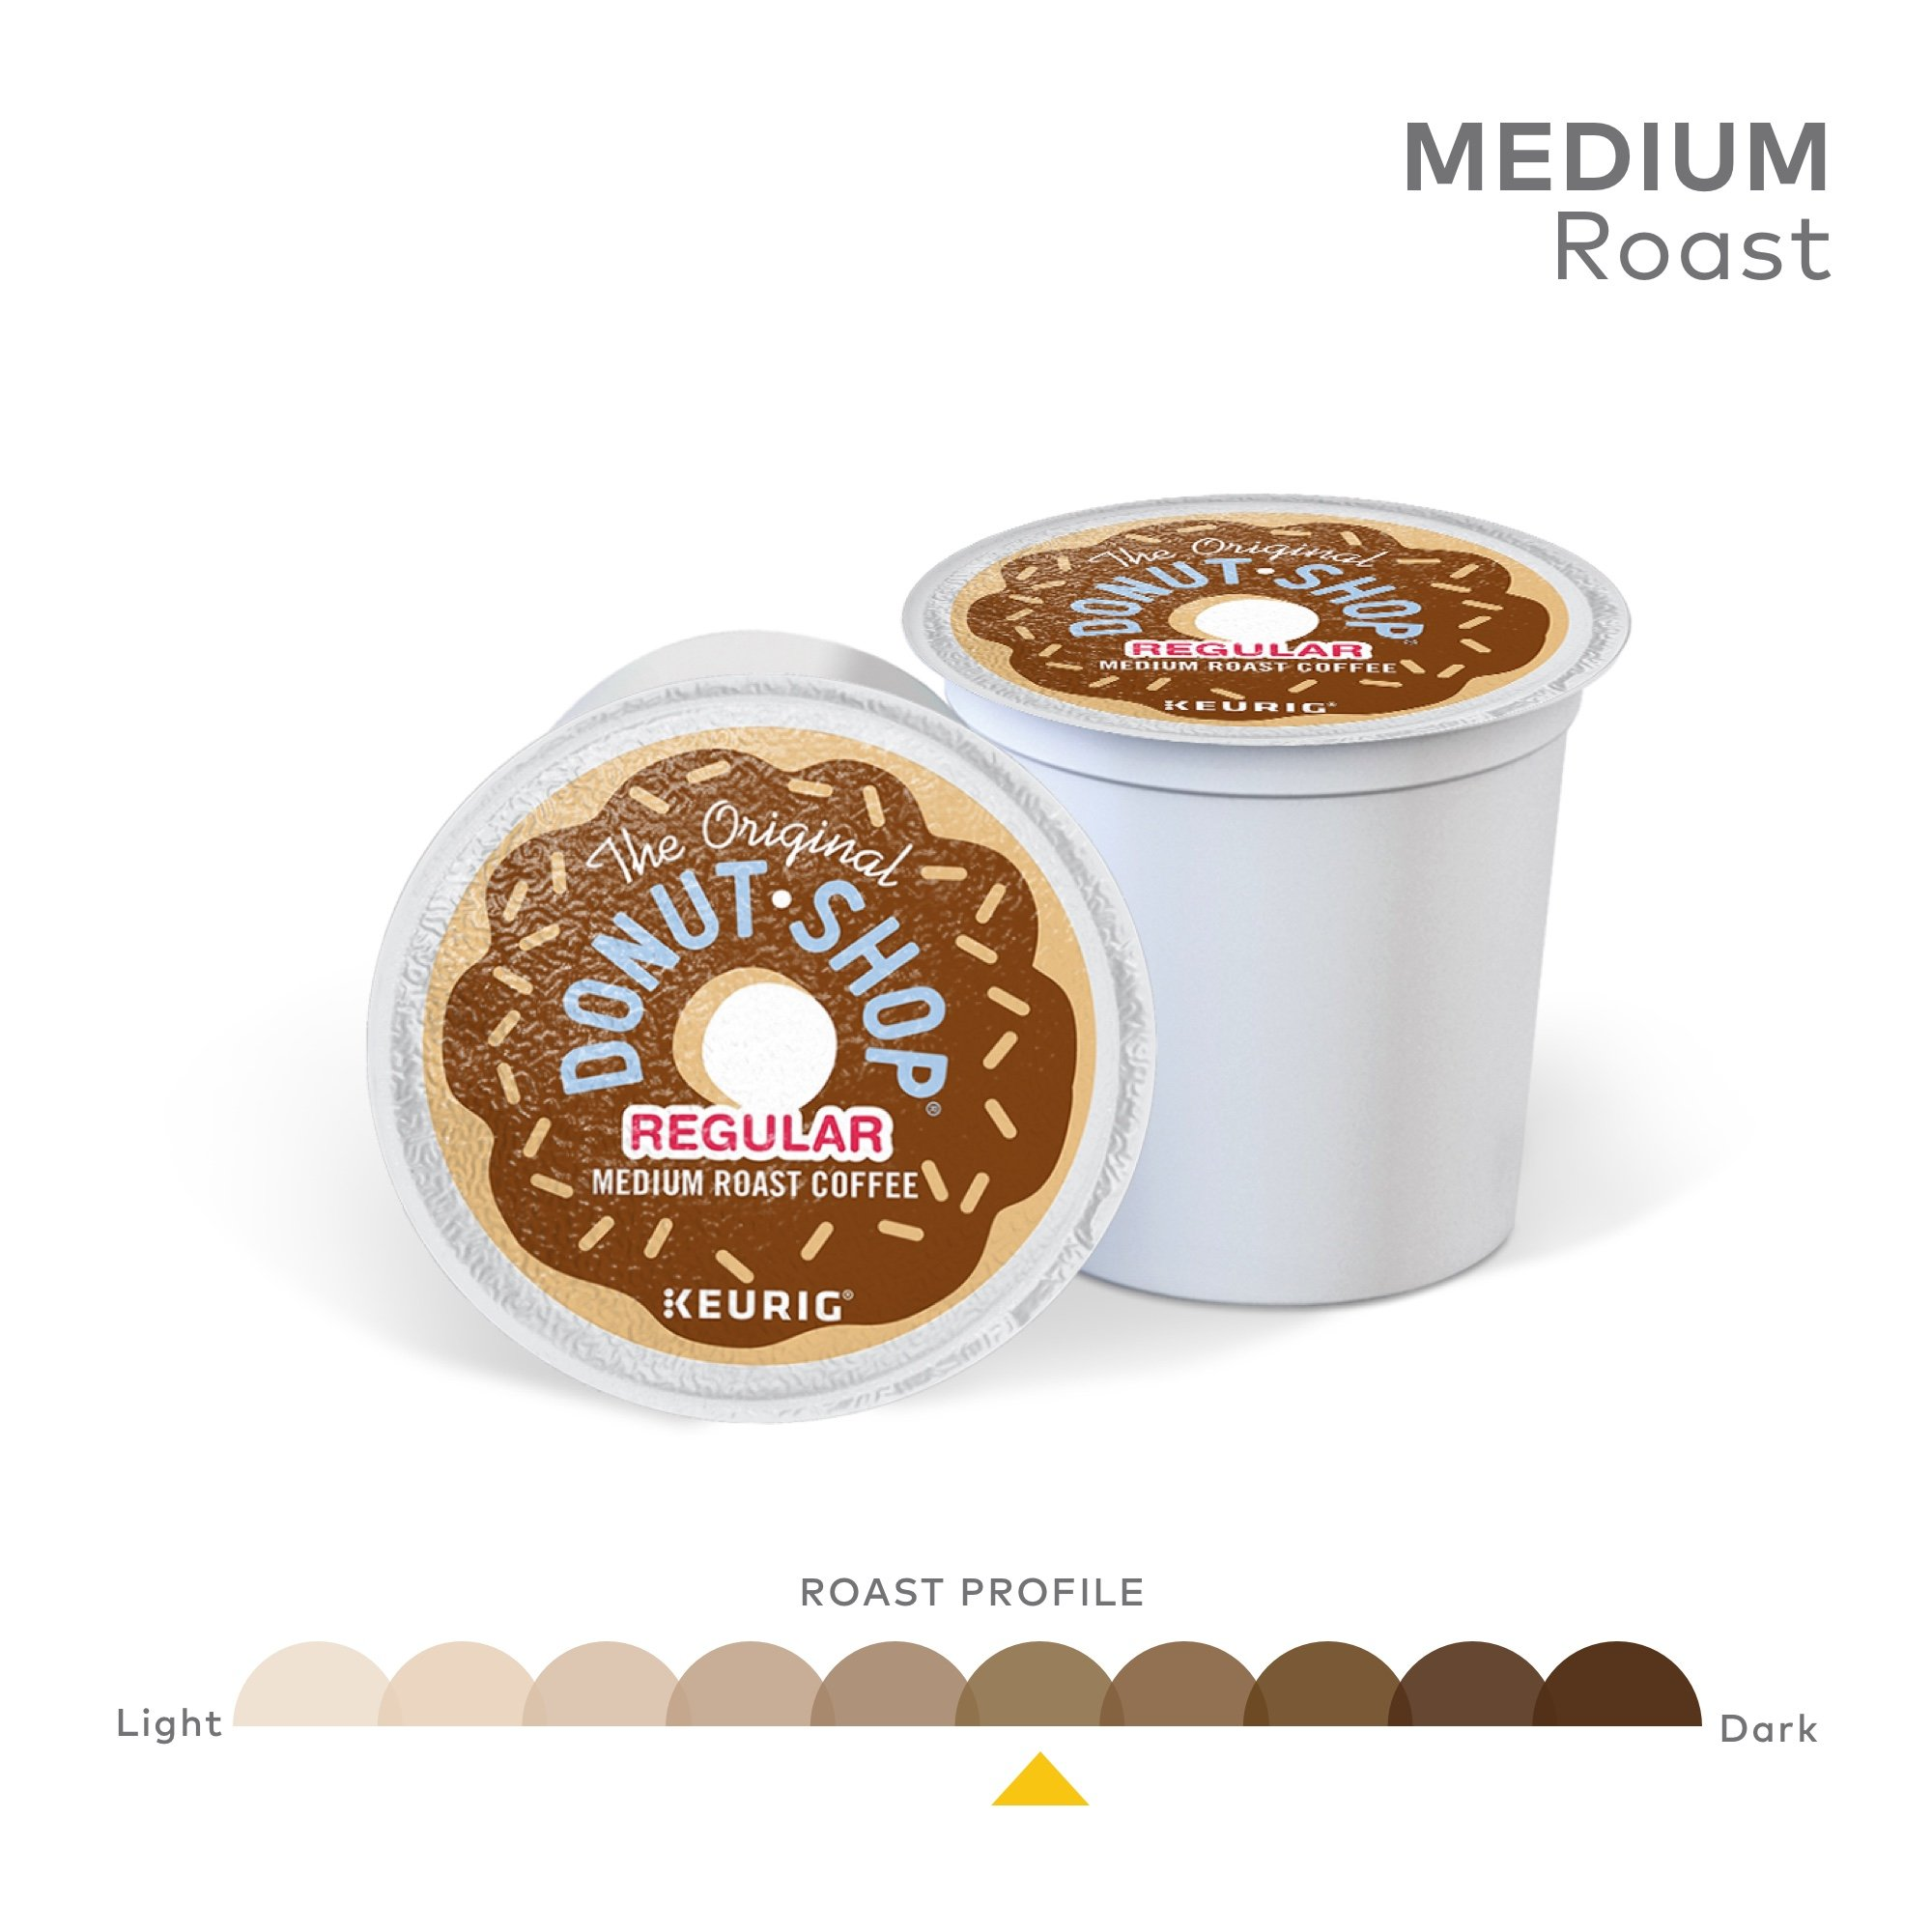 The Original Donut Shop Coffee, Regular Medium Roast, K-Cup Portion Count for Keurig Brewers 24-Count (Pack of 4) by The Original Donut Shop (Image #4)